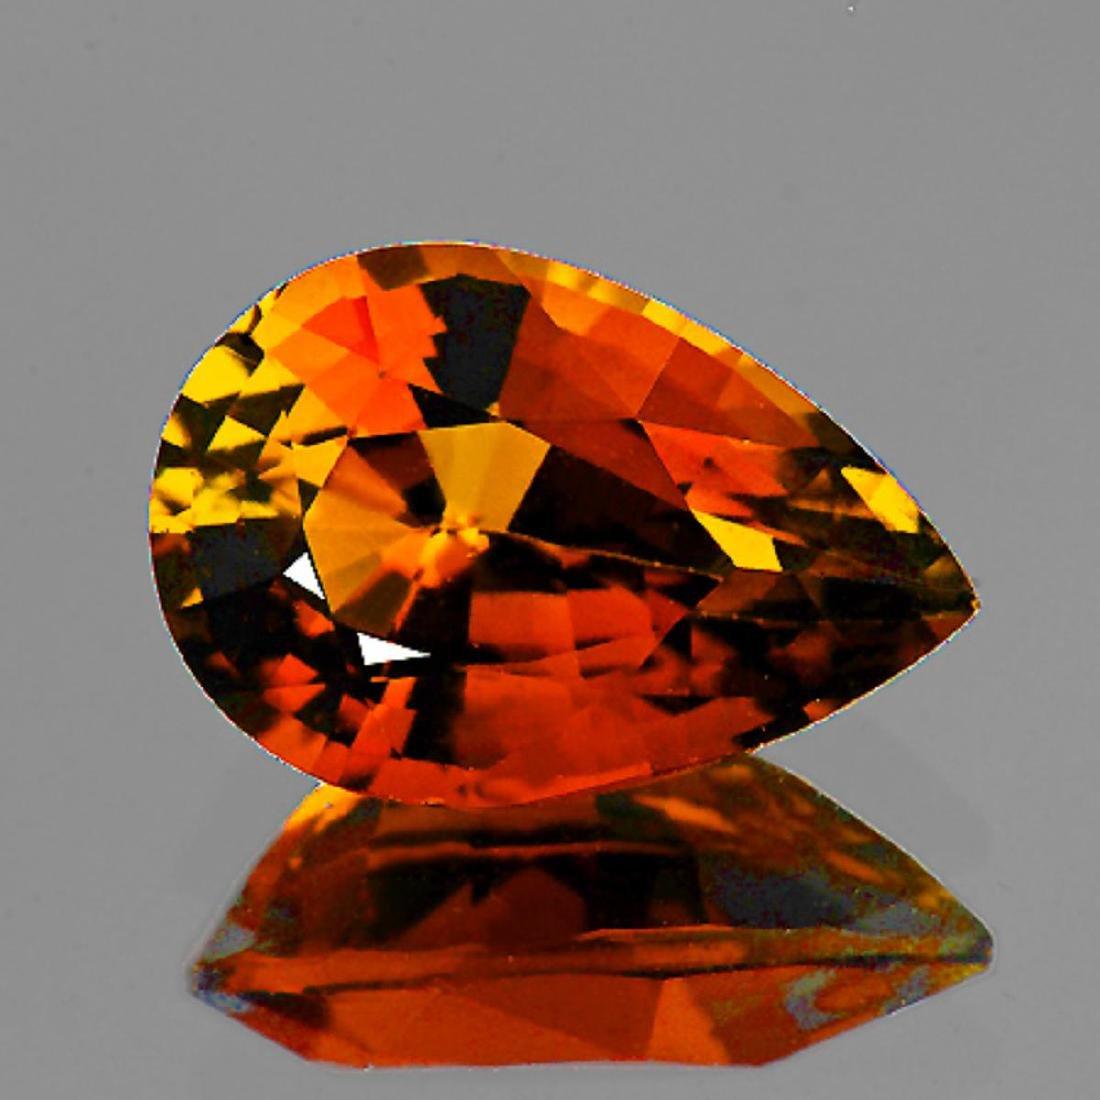 Natural AAA Vivid Orange Tourmaline 1.40 Ct - Flawless